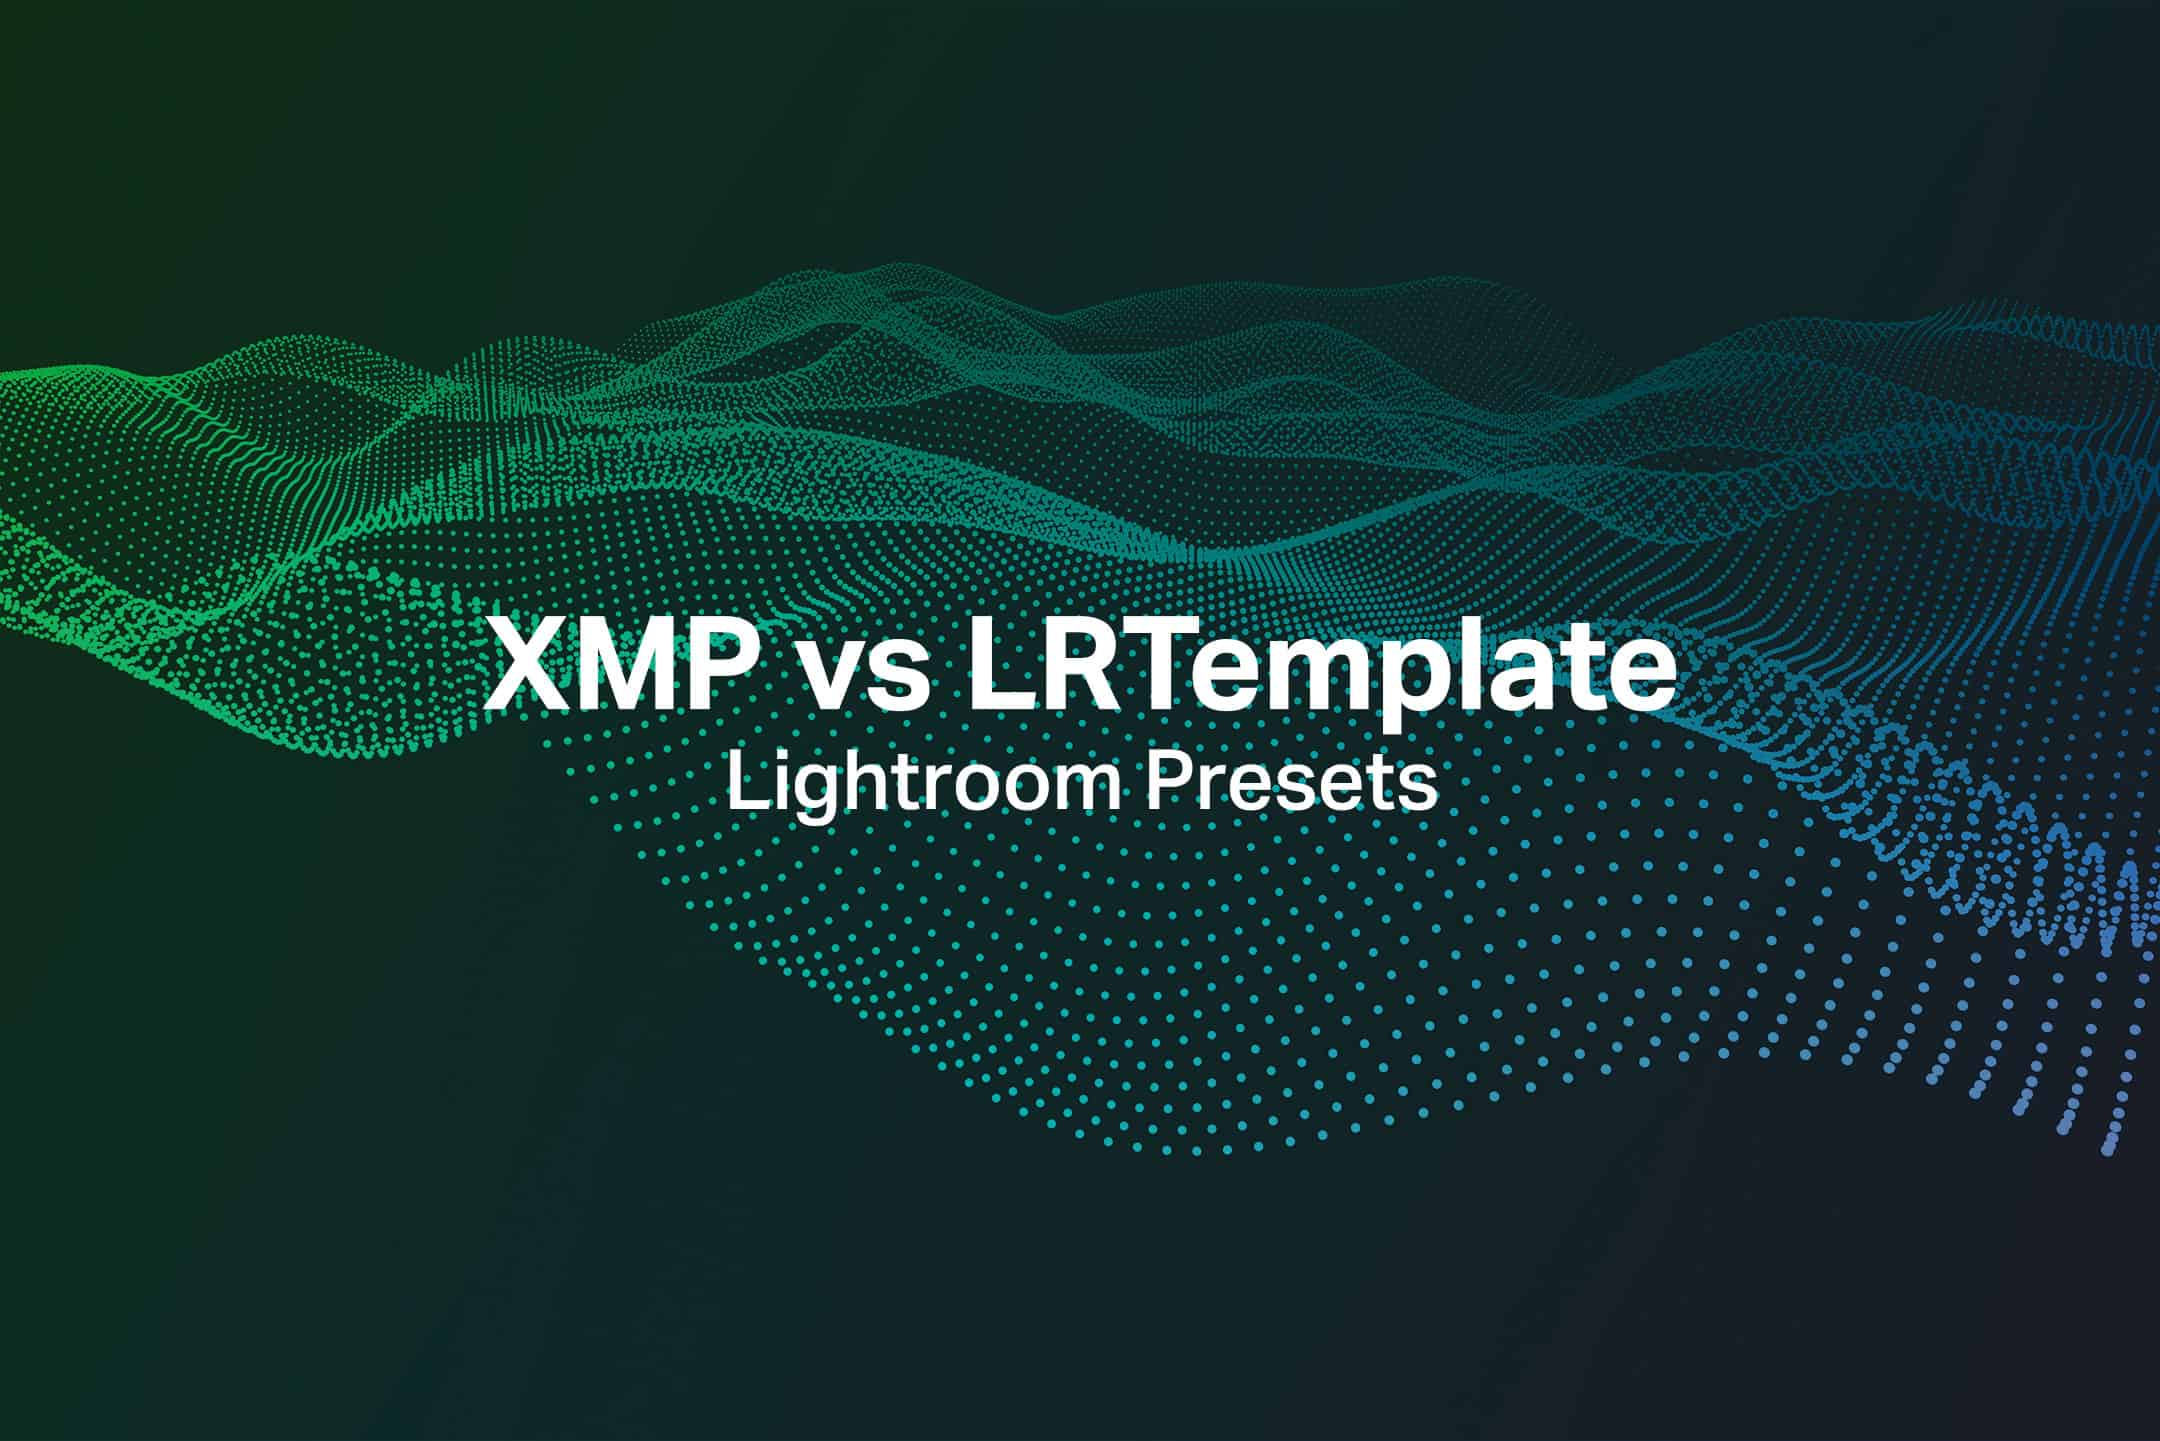 New vs Old: XMP vs LRTemplate Lightroom Presets